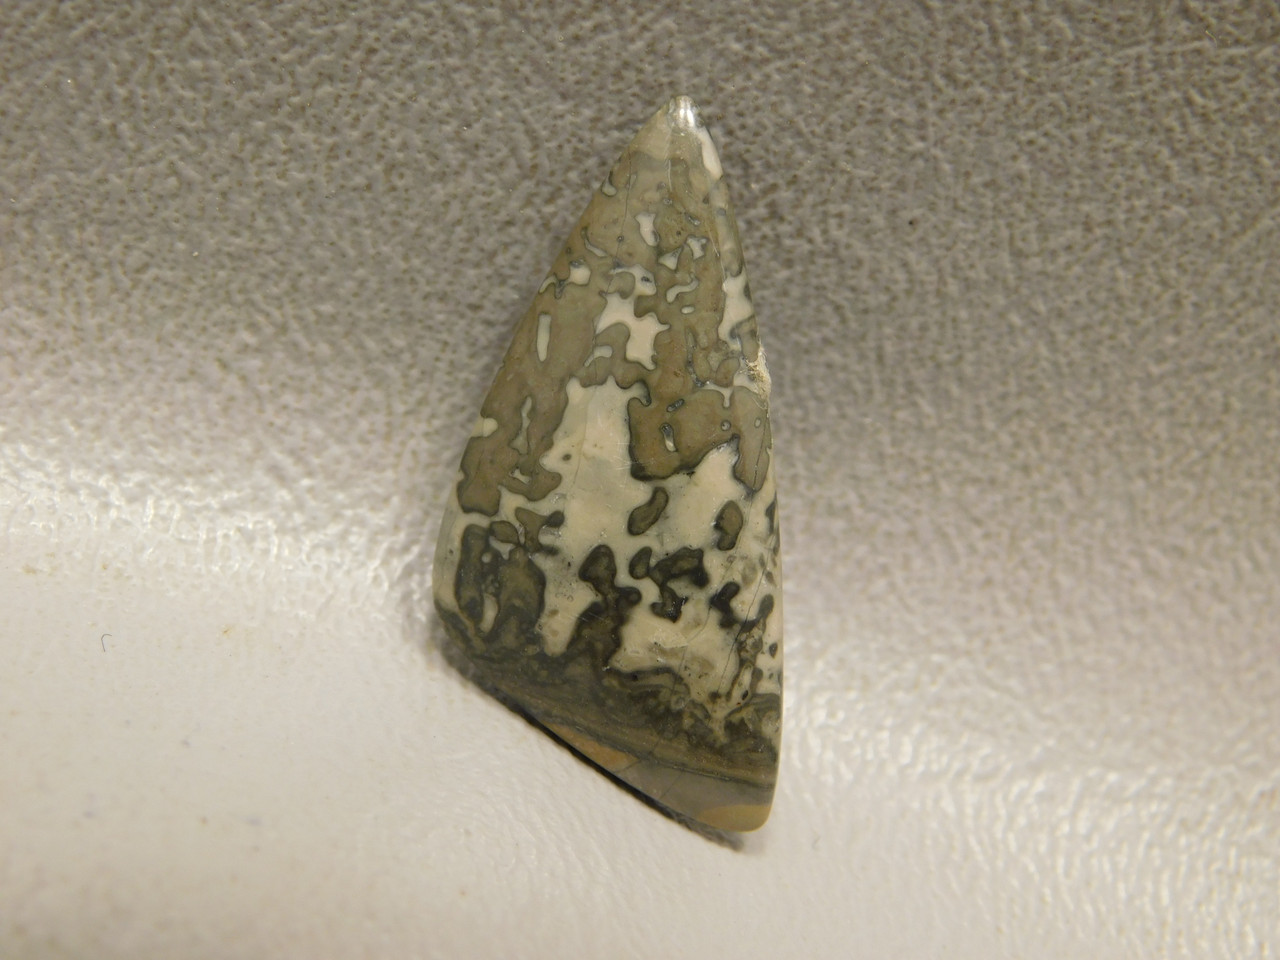 Cotham Marble Cabochon Fossil Stromatolite Jewelry Stone #23